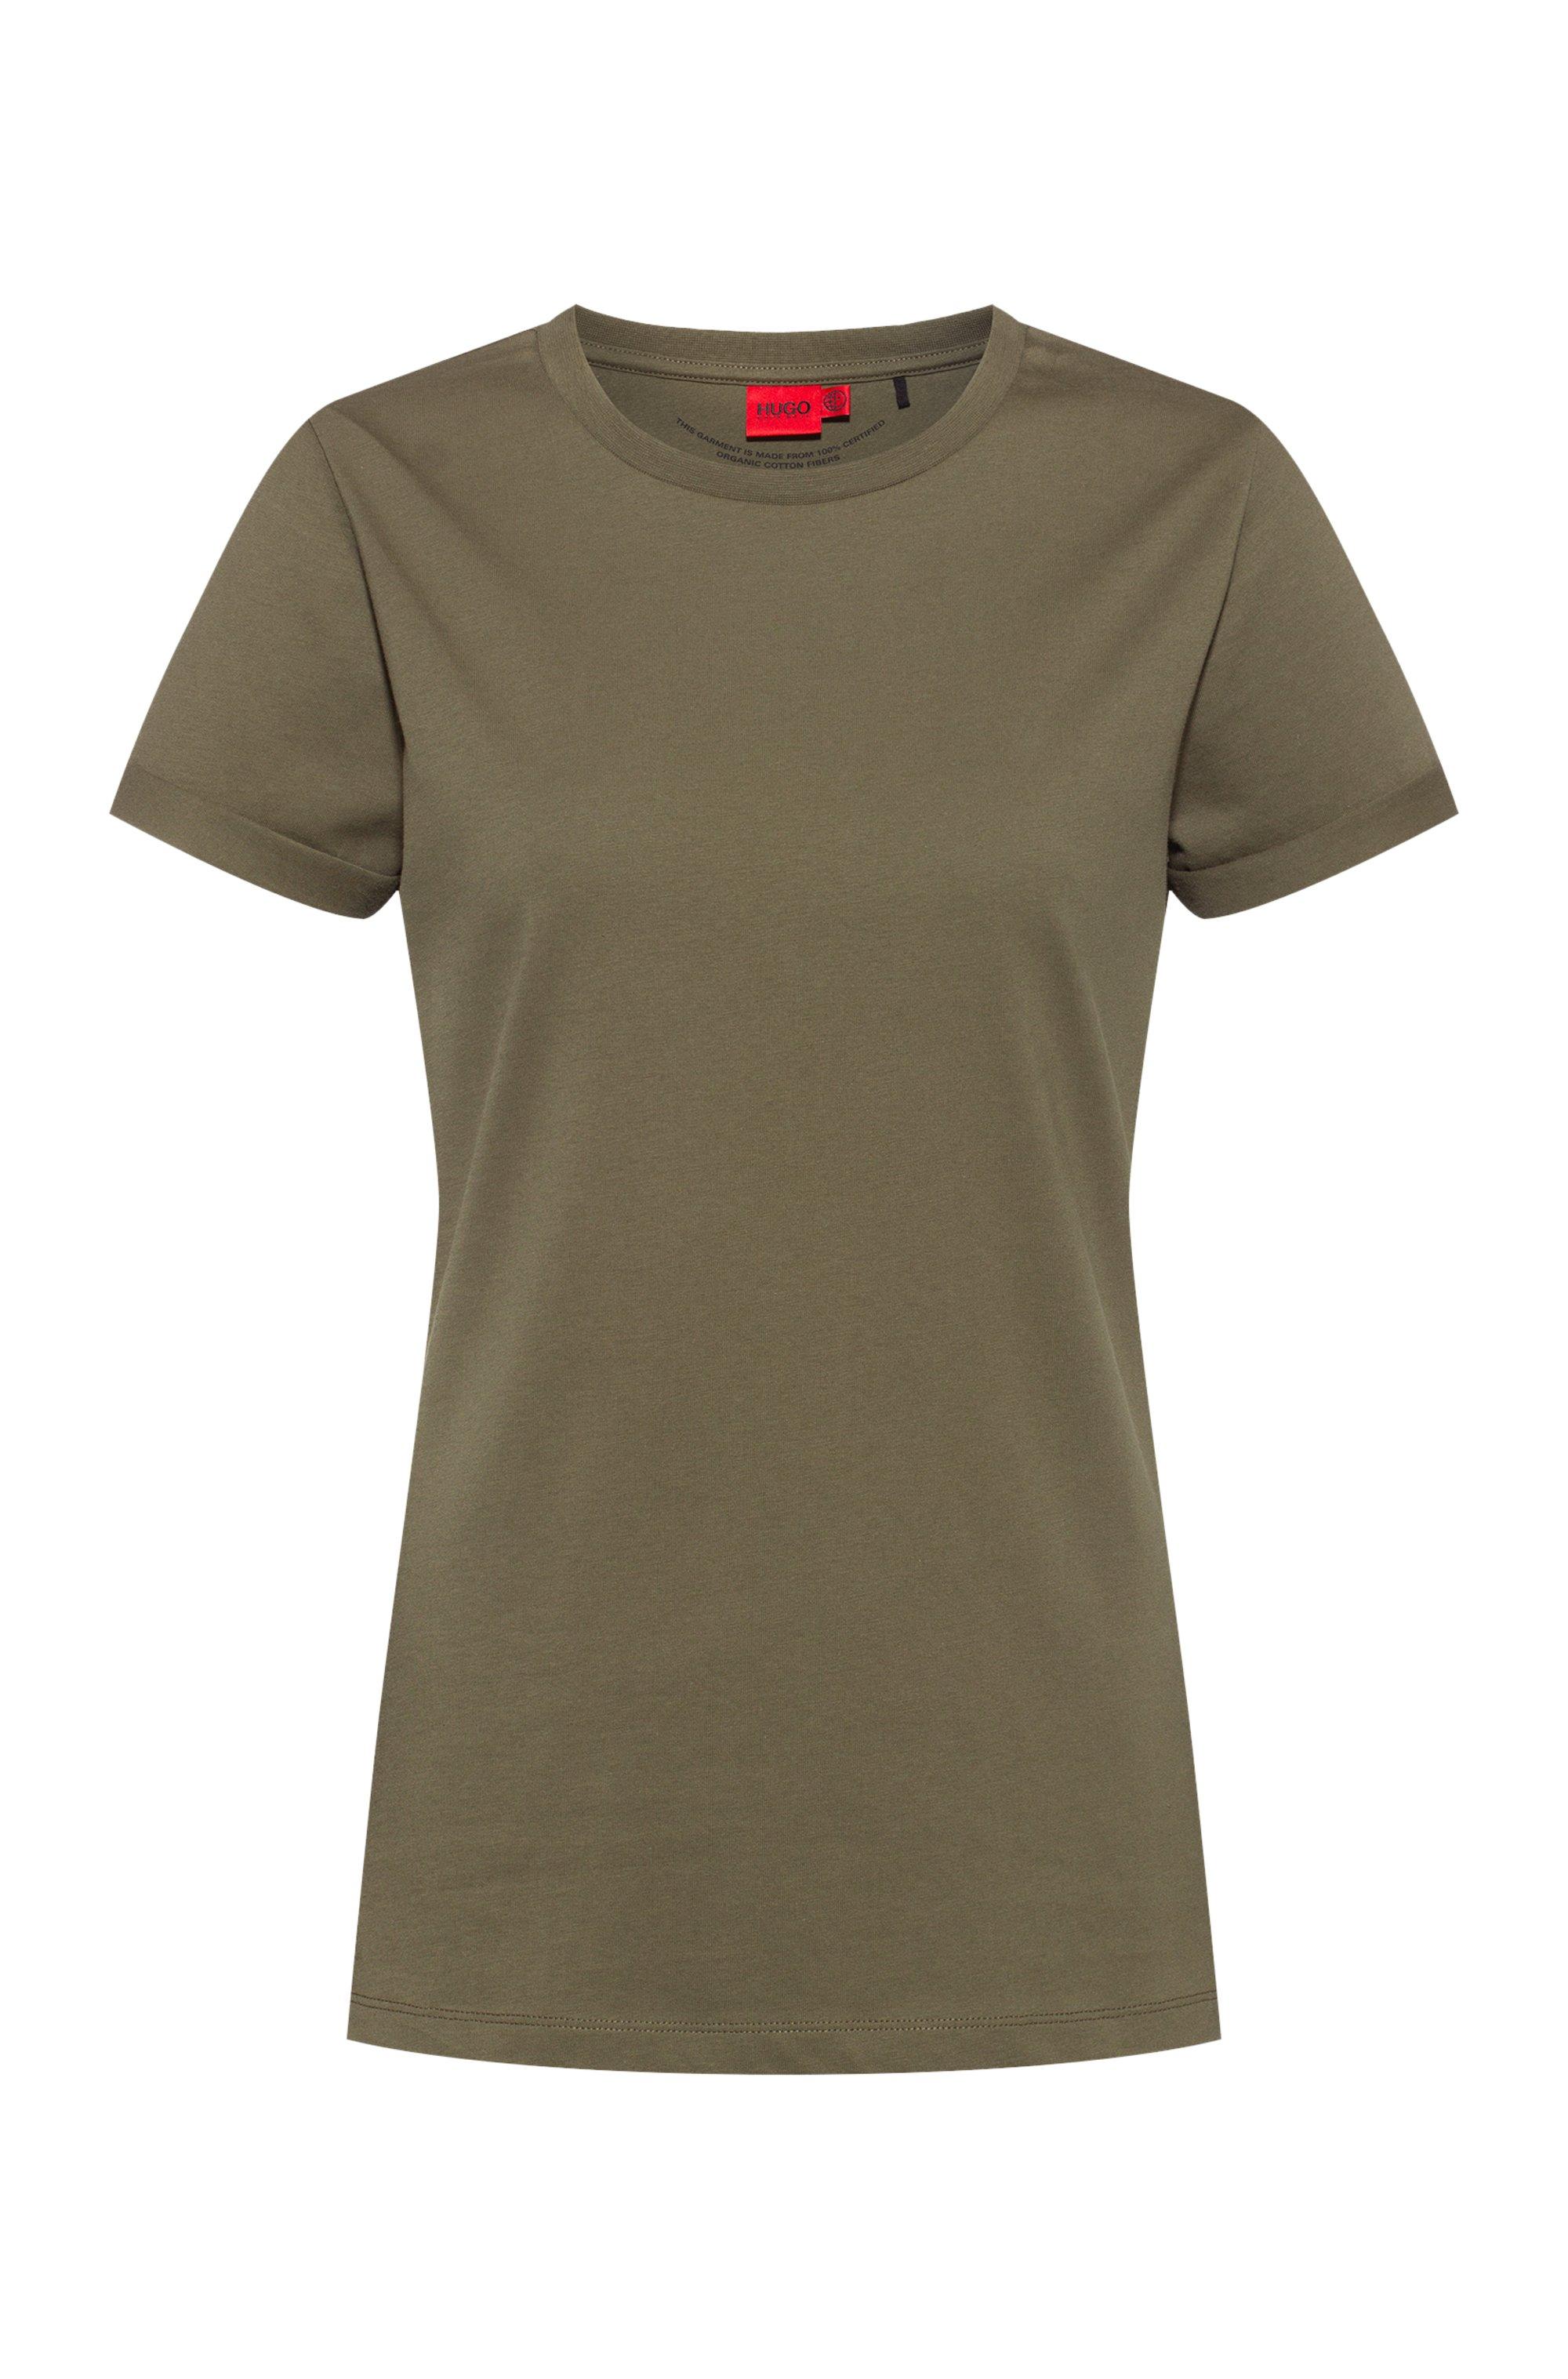 Slim-fit T-shirt in organic-cotton jersey, Khaki